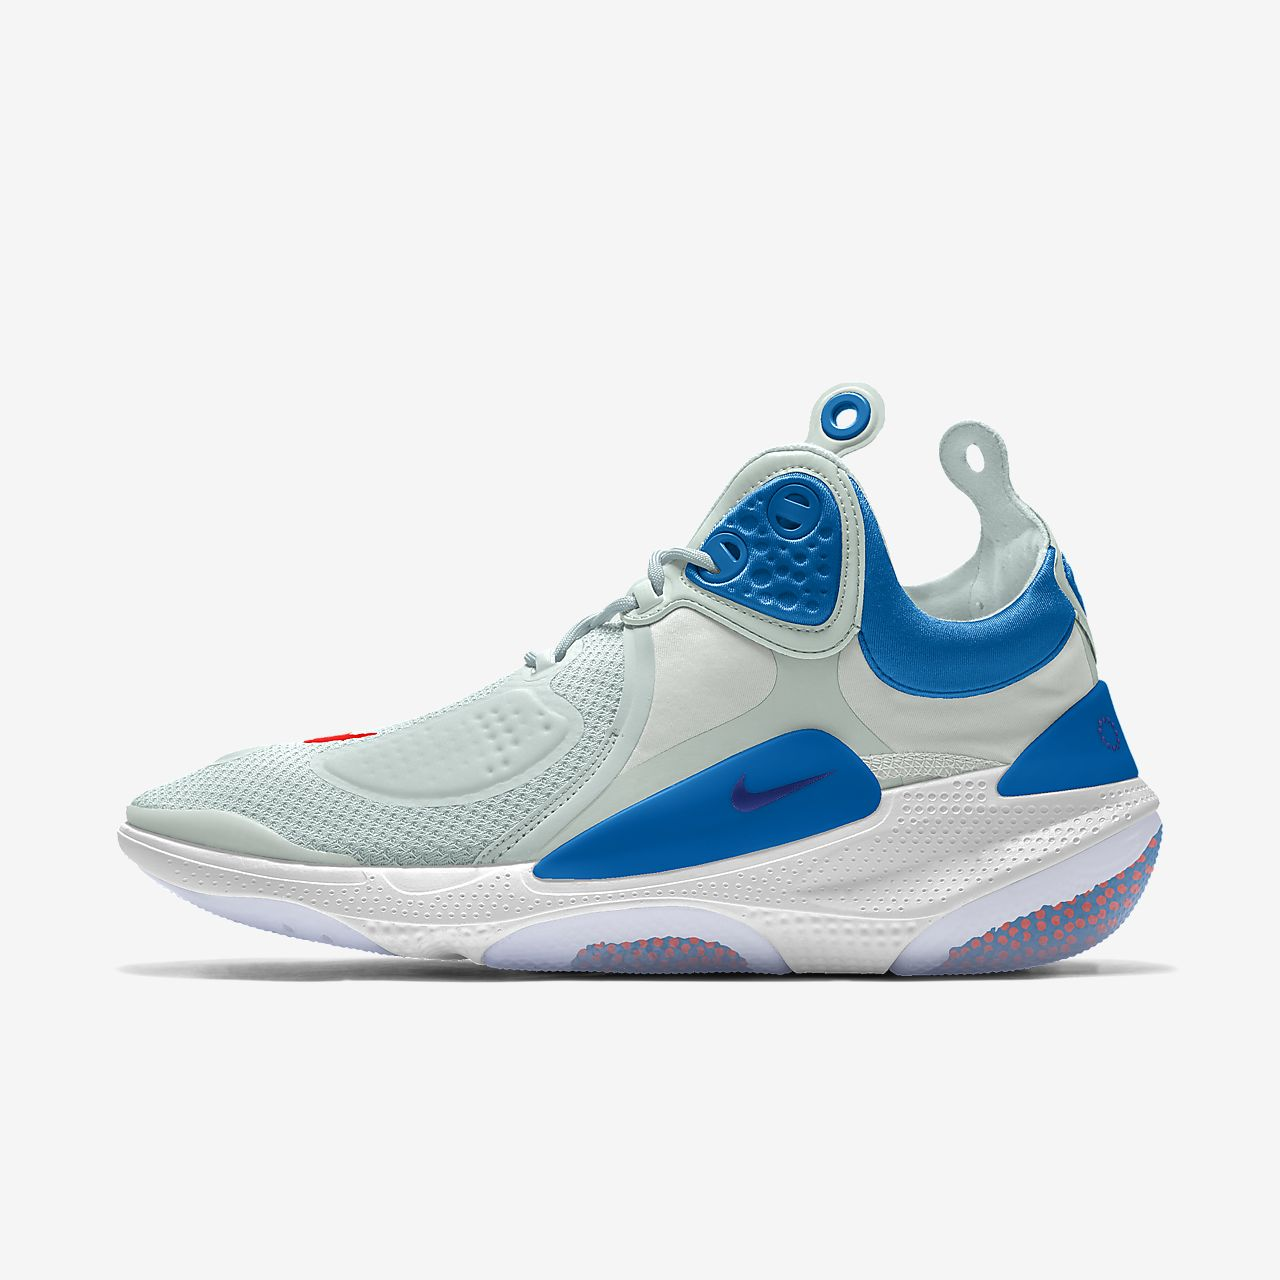 Chaussure personnalisable Nike Joyride CC3 Setter By You pour Homme